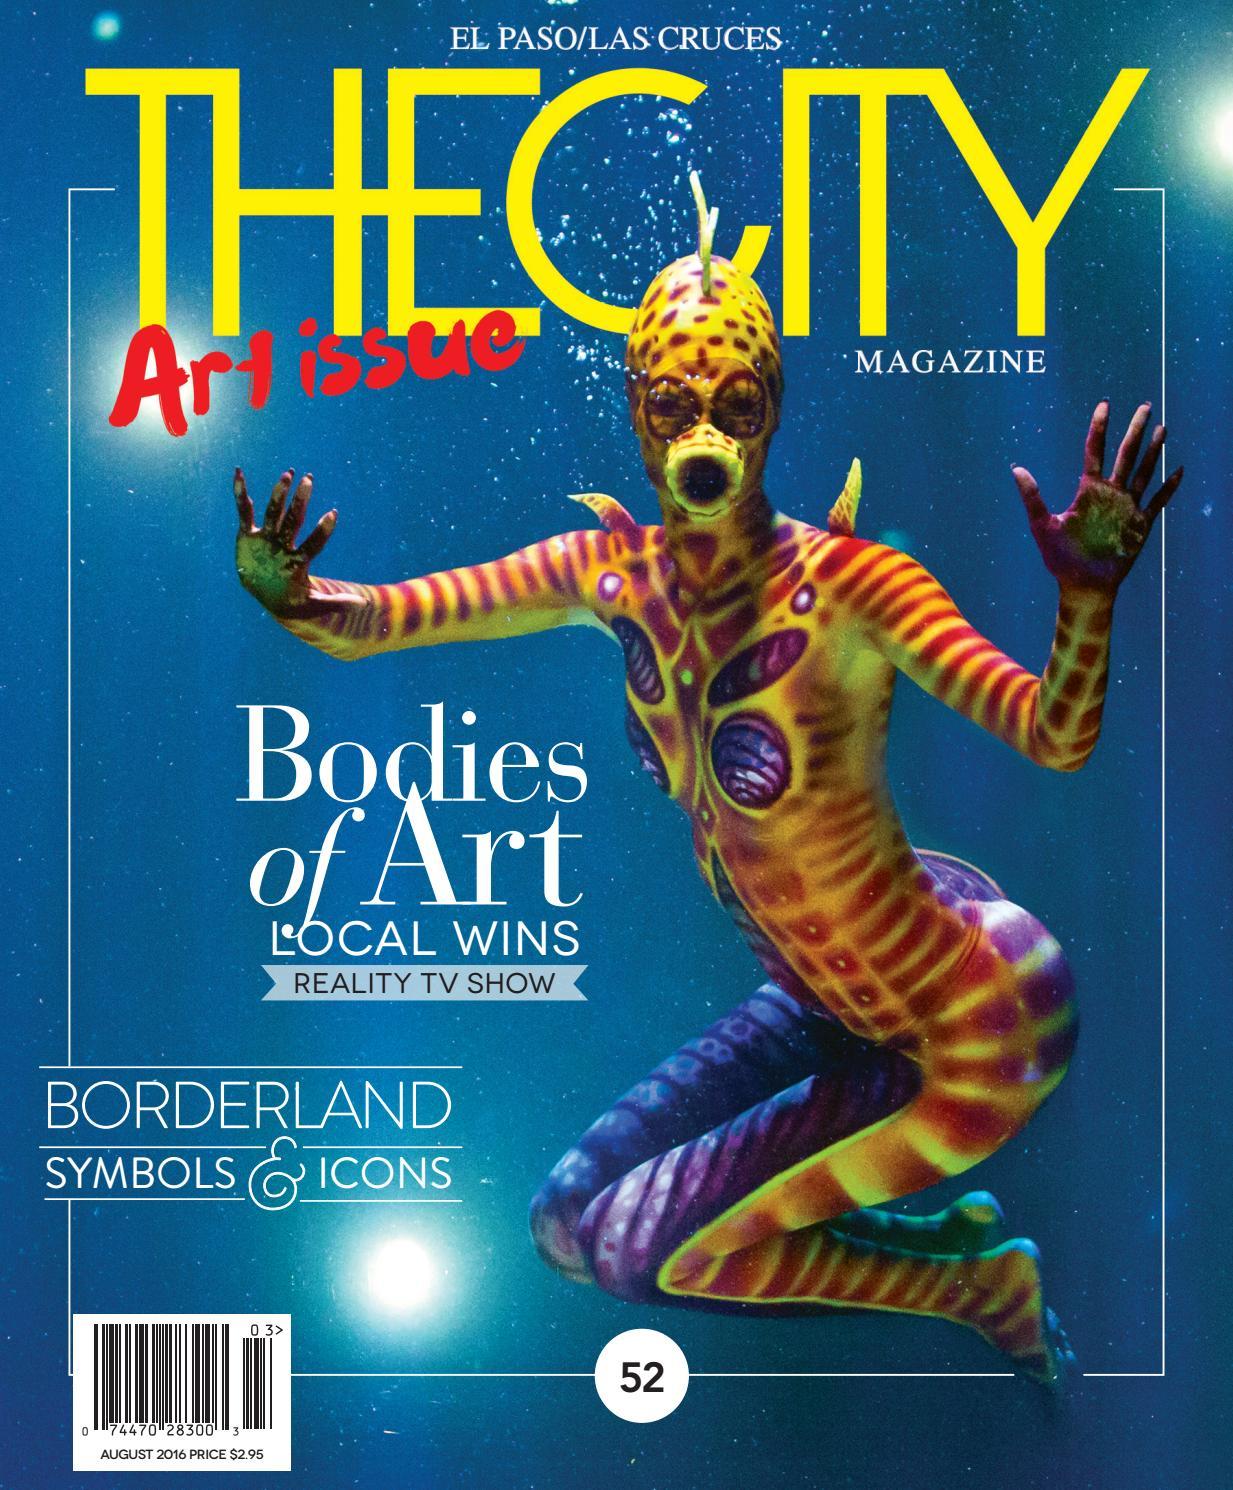 thecity magazine el paso  u2022 august 2016 by thecity magazine